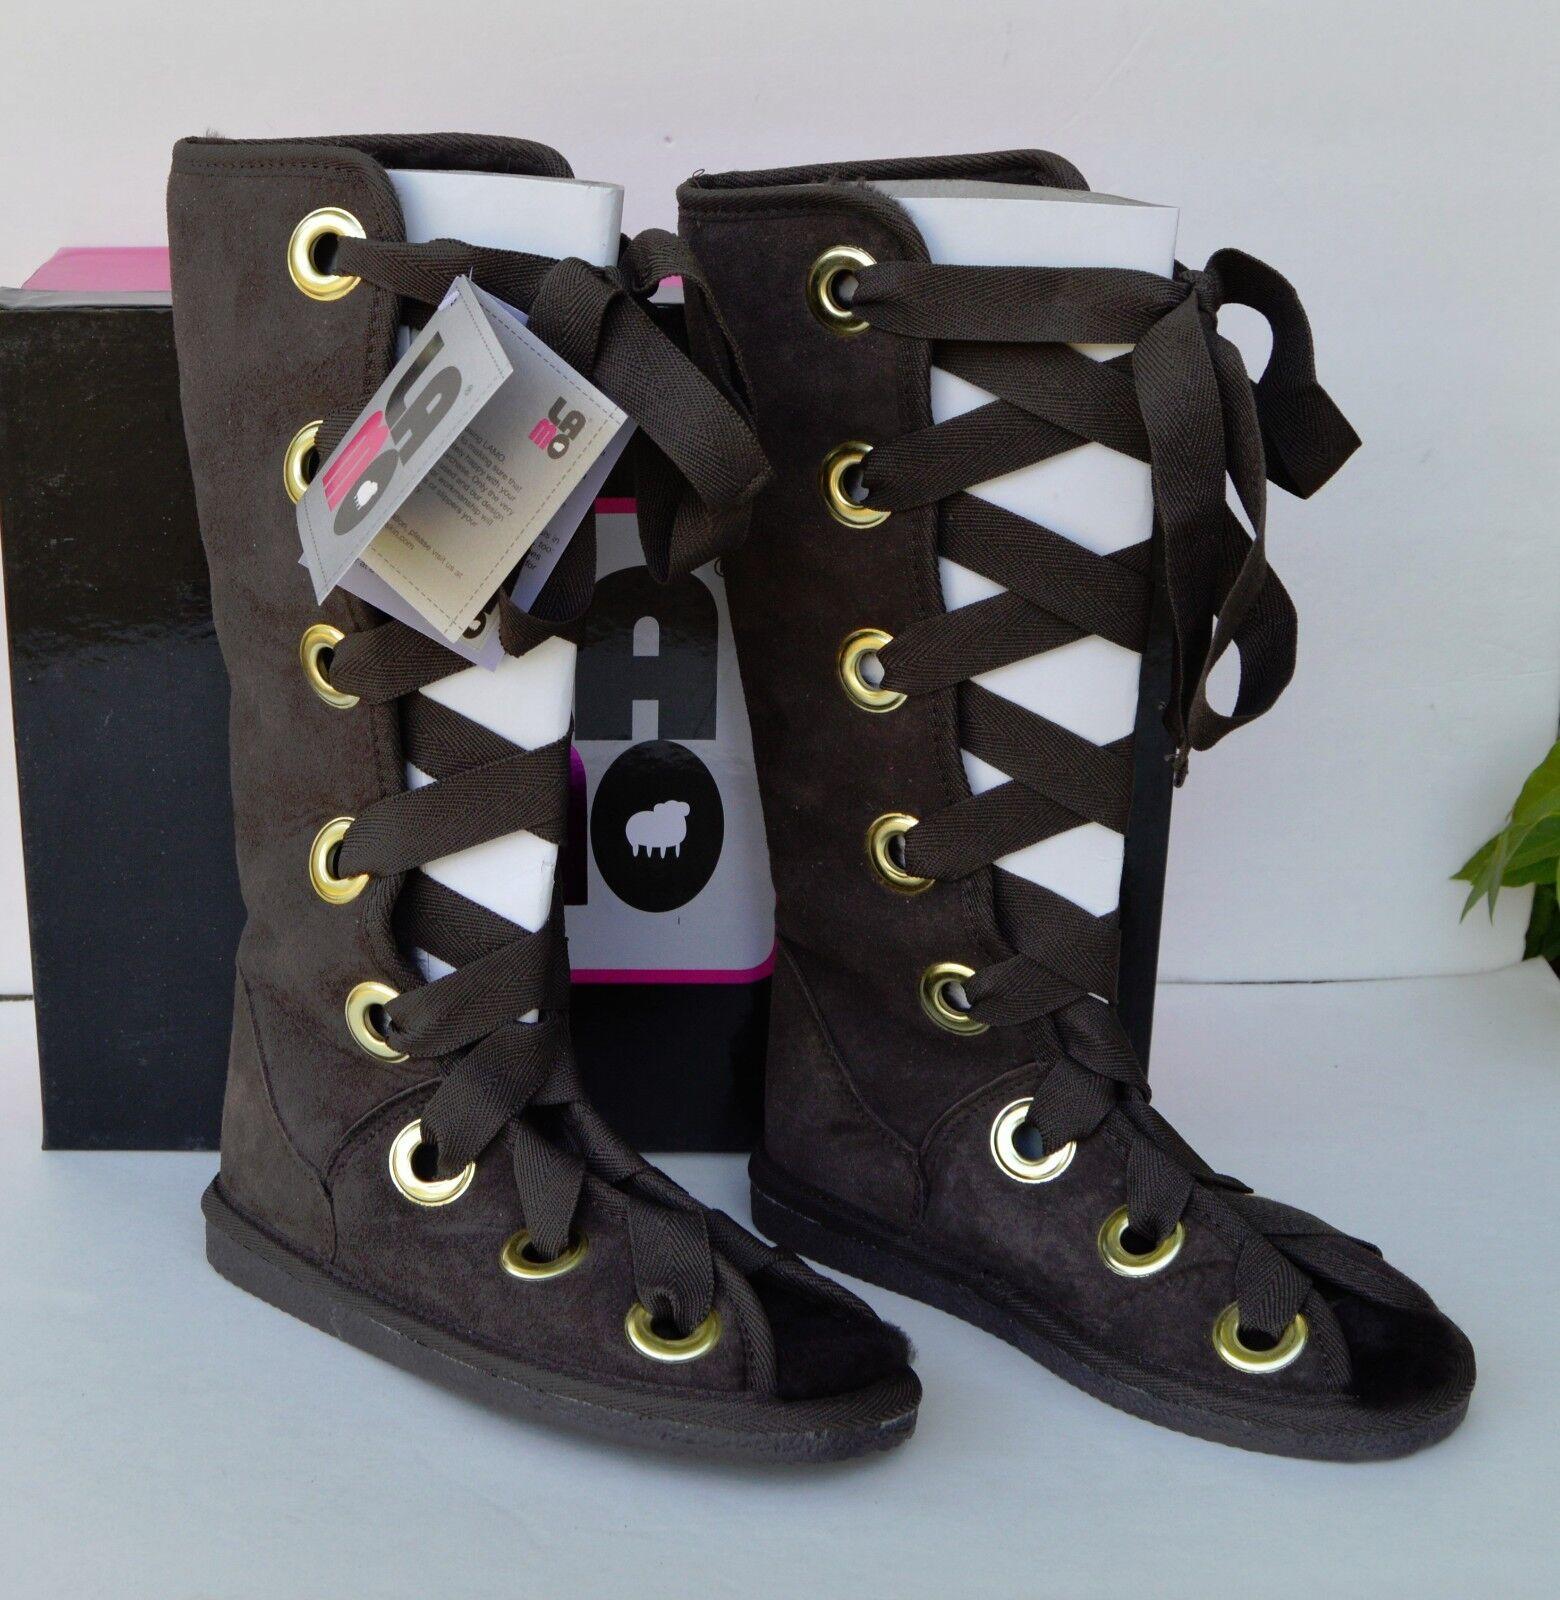 NEW! Lamo Edison Green Sheepskin Women's Gladiator Tall Boots Fur Lined Sz 10